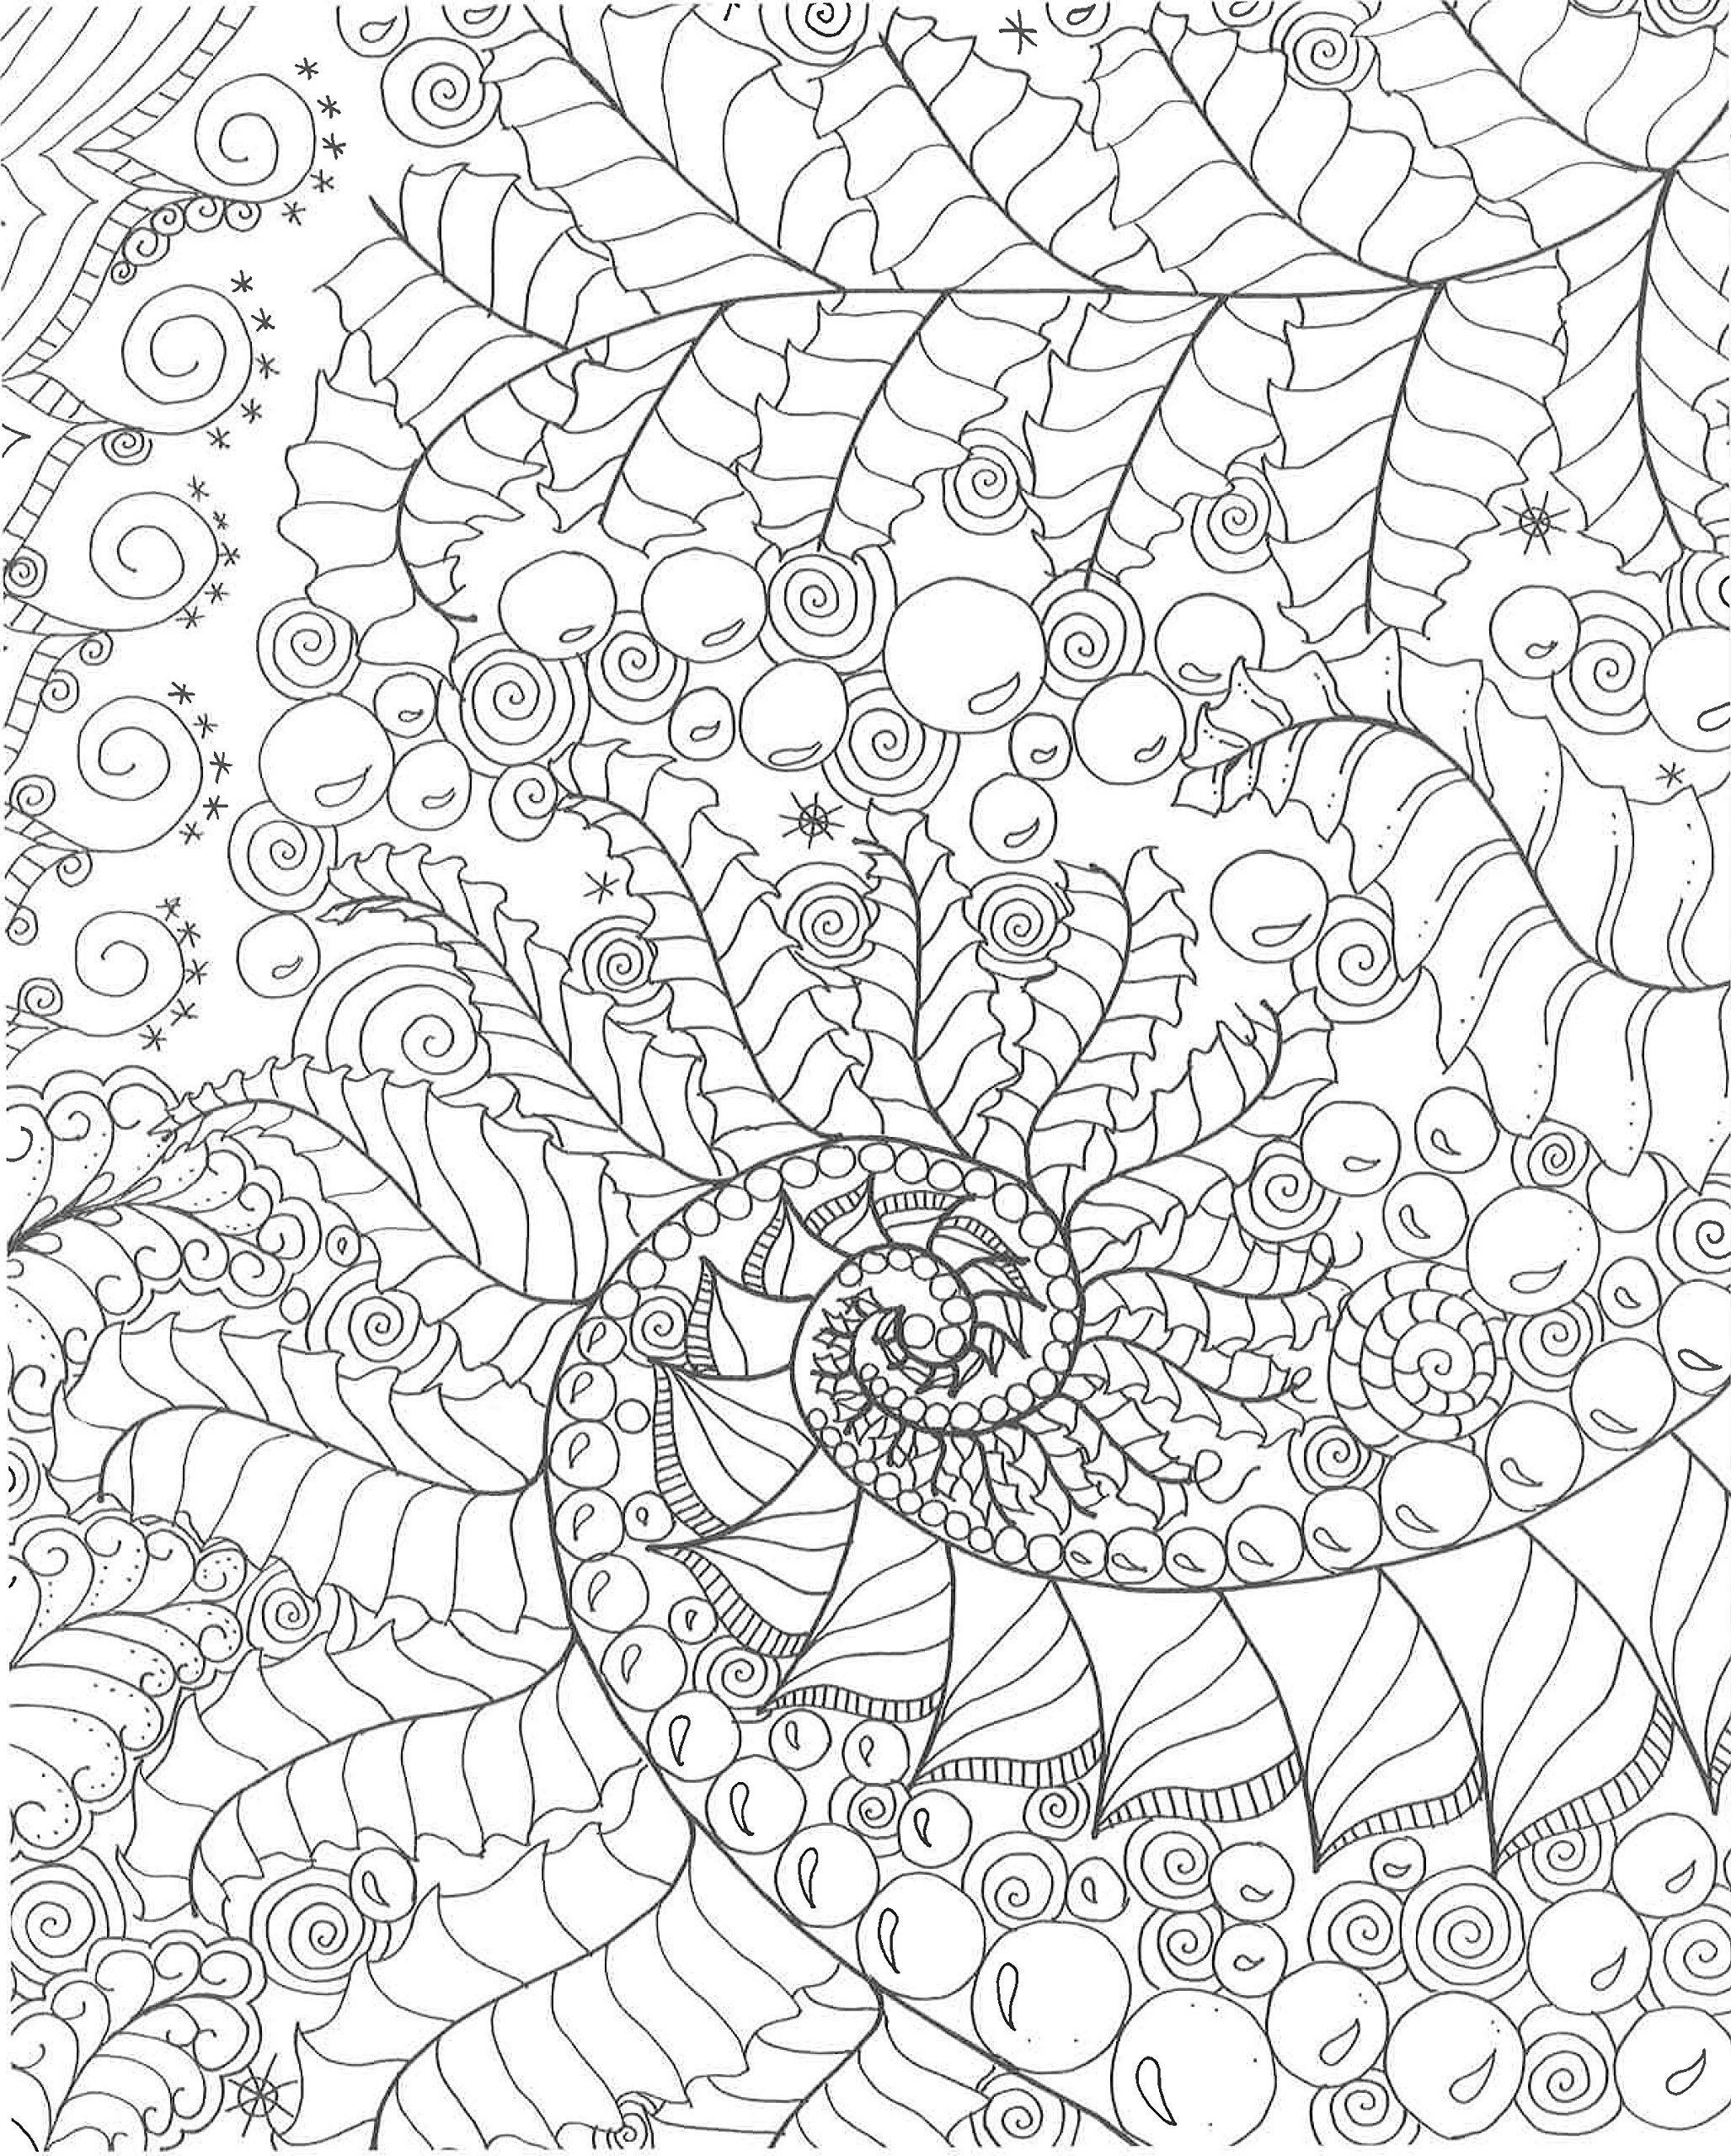 Zendoodle Coloring Calming Swirls Amazon Co Uk Nikolett Corley Books Coloring Books Mandala Coloring Pages Coloring Pages For Grown Ups